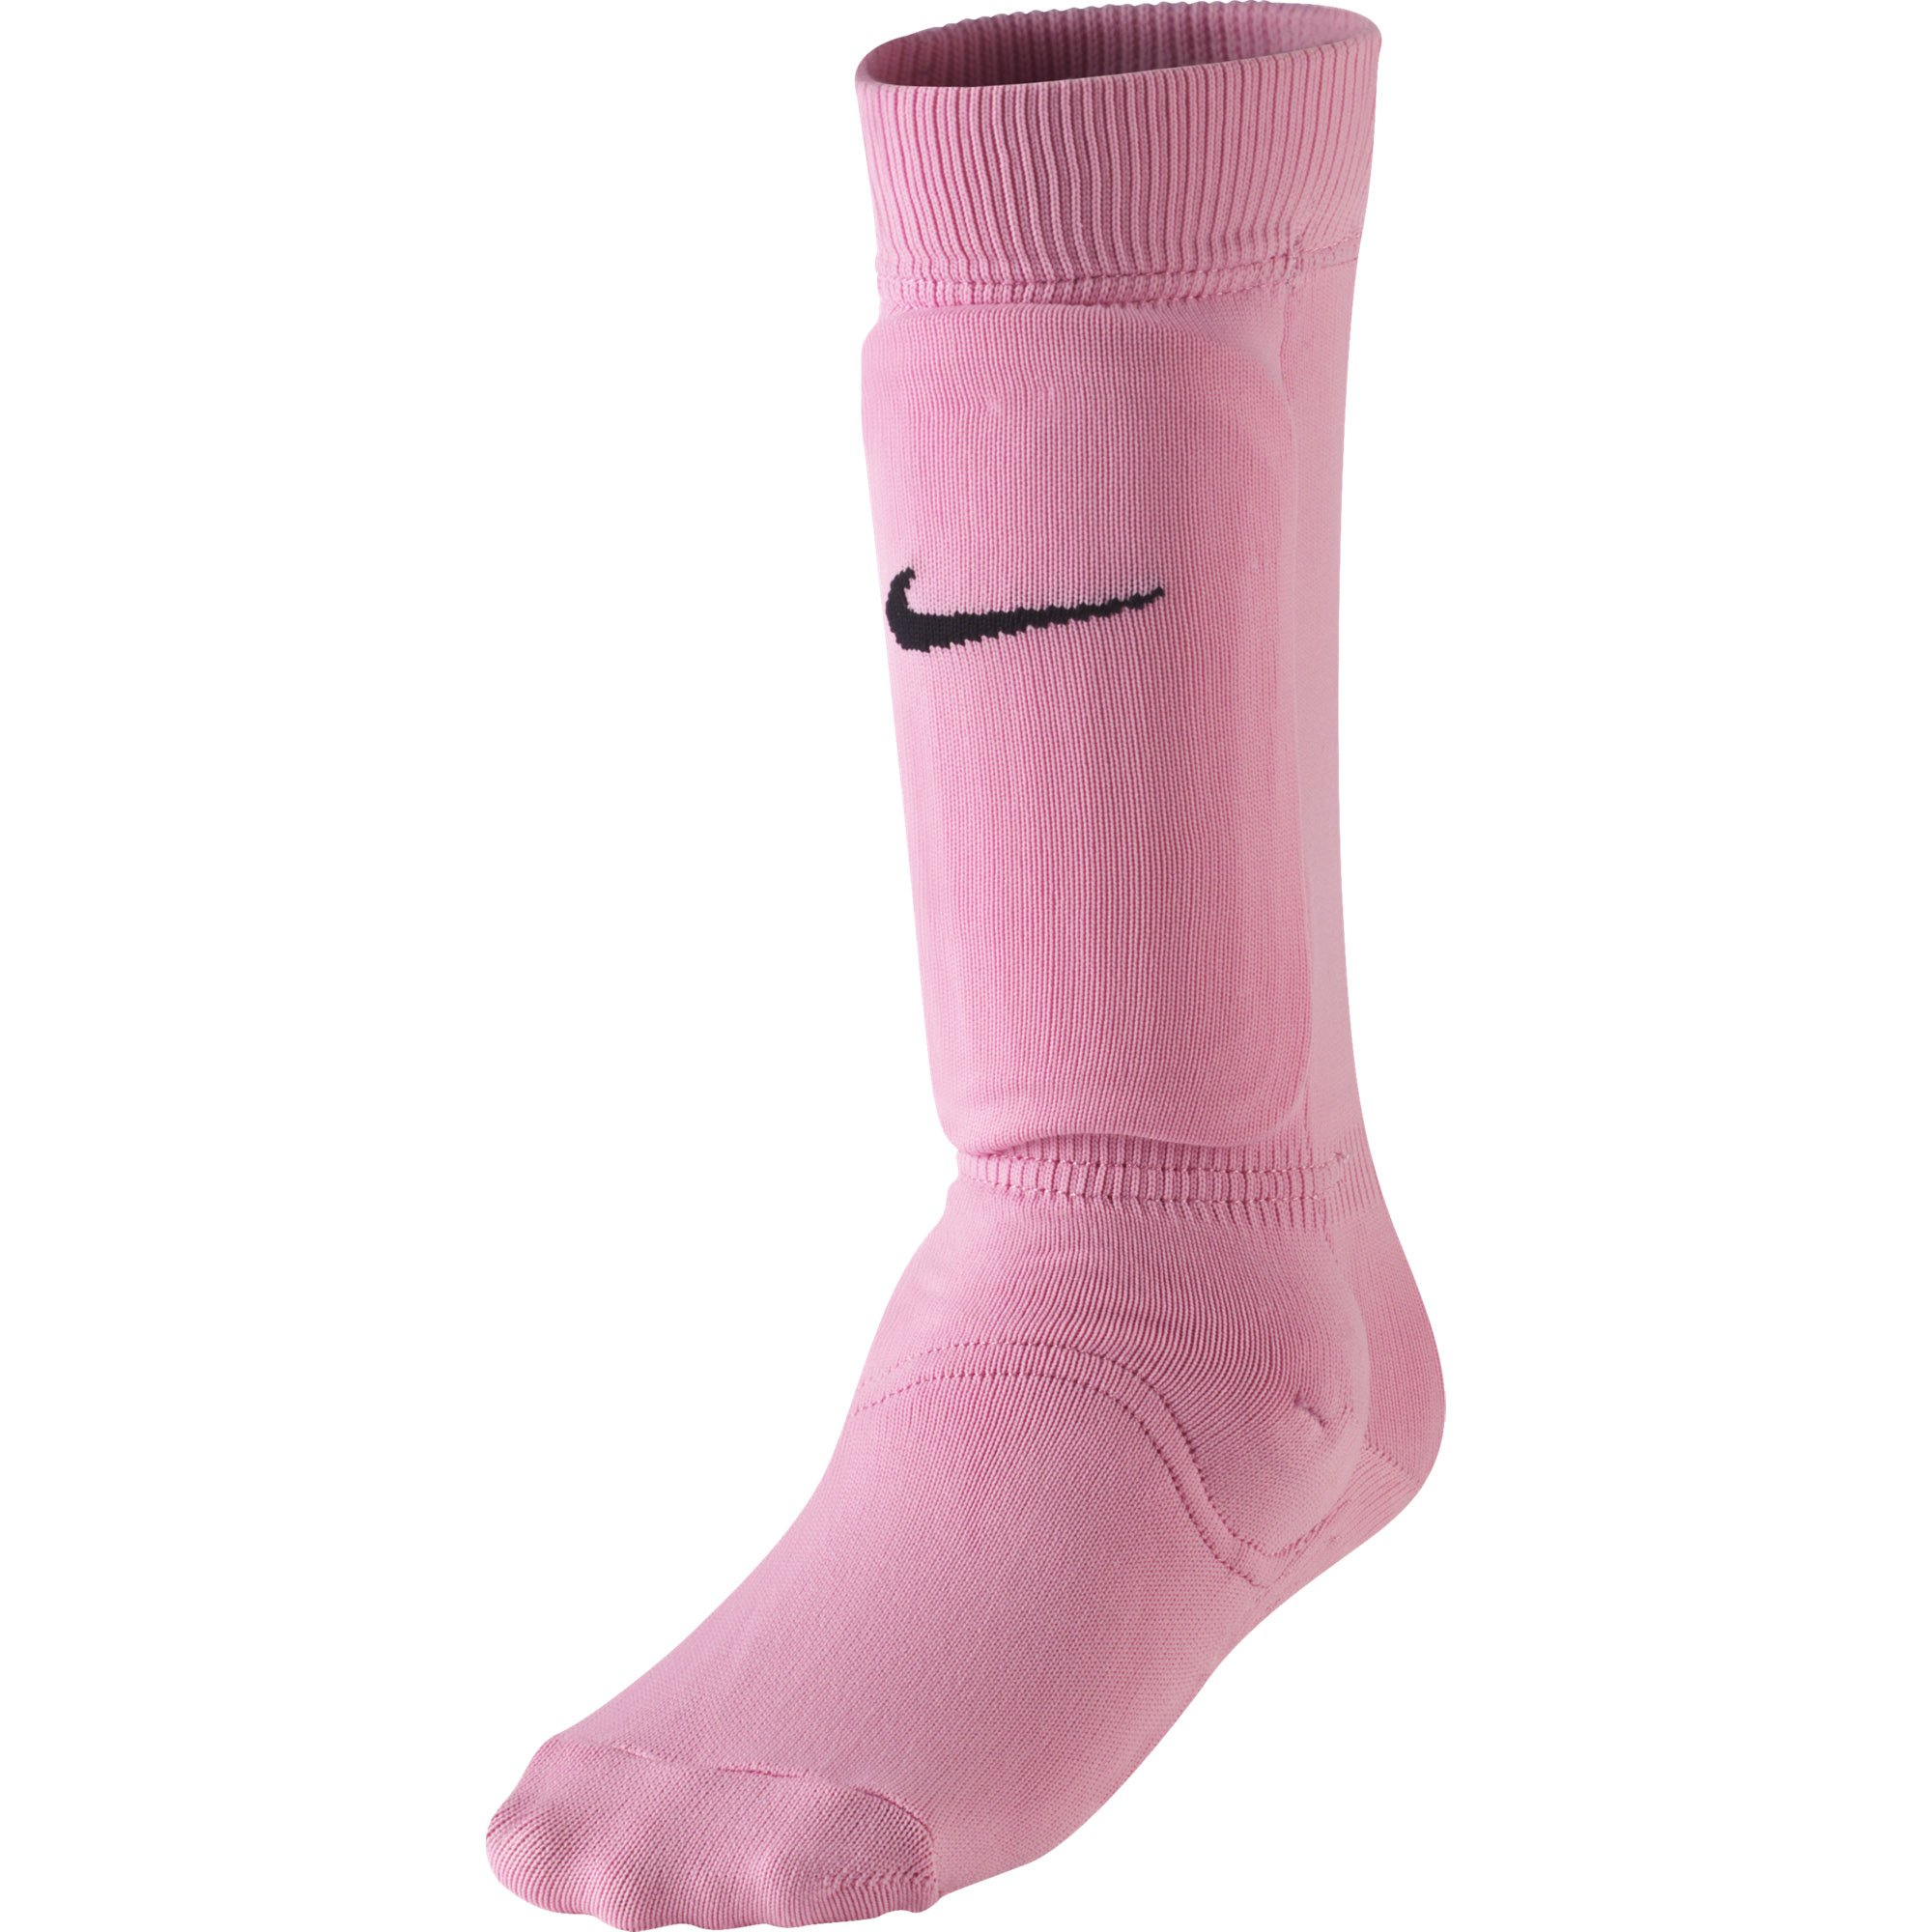 NIKE Kids' Unisex Shin Sock Sleeve, Pink Blast/Black, Large/X-Large by NIKE